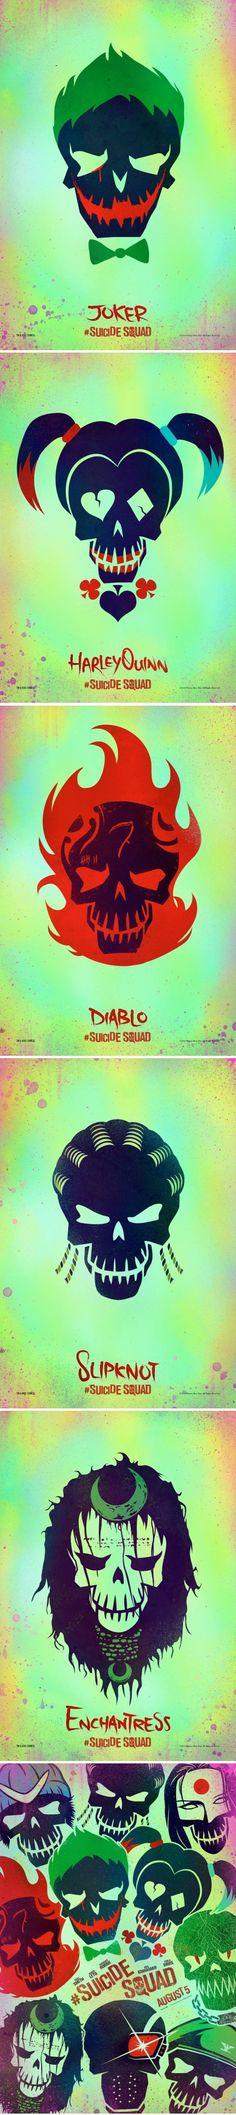 Suicide Squad Character Posters - Joker, Harley Quinn, Diablo, Slipknot & Enchantress(Geek Stuff)